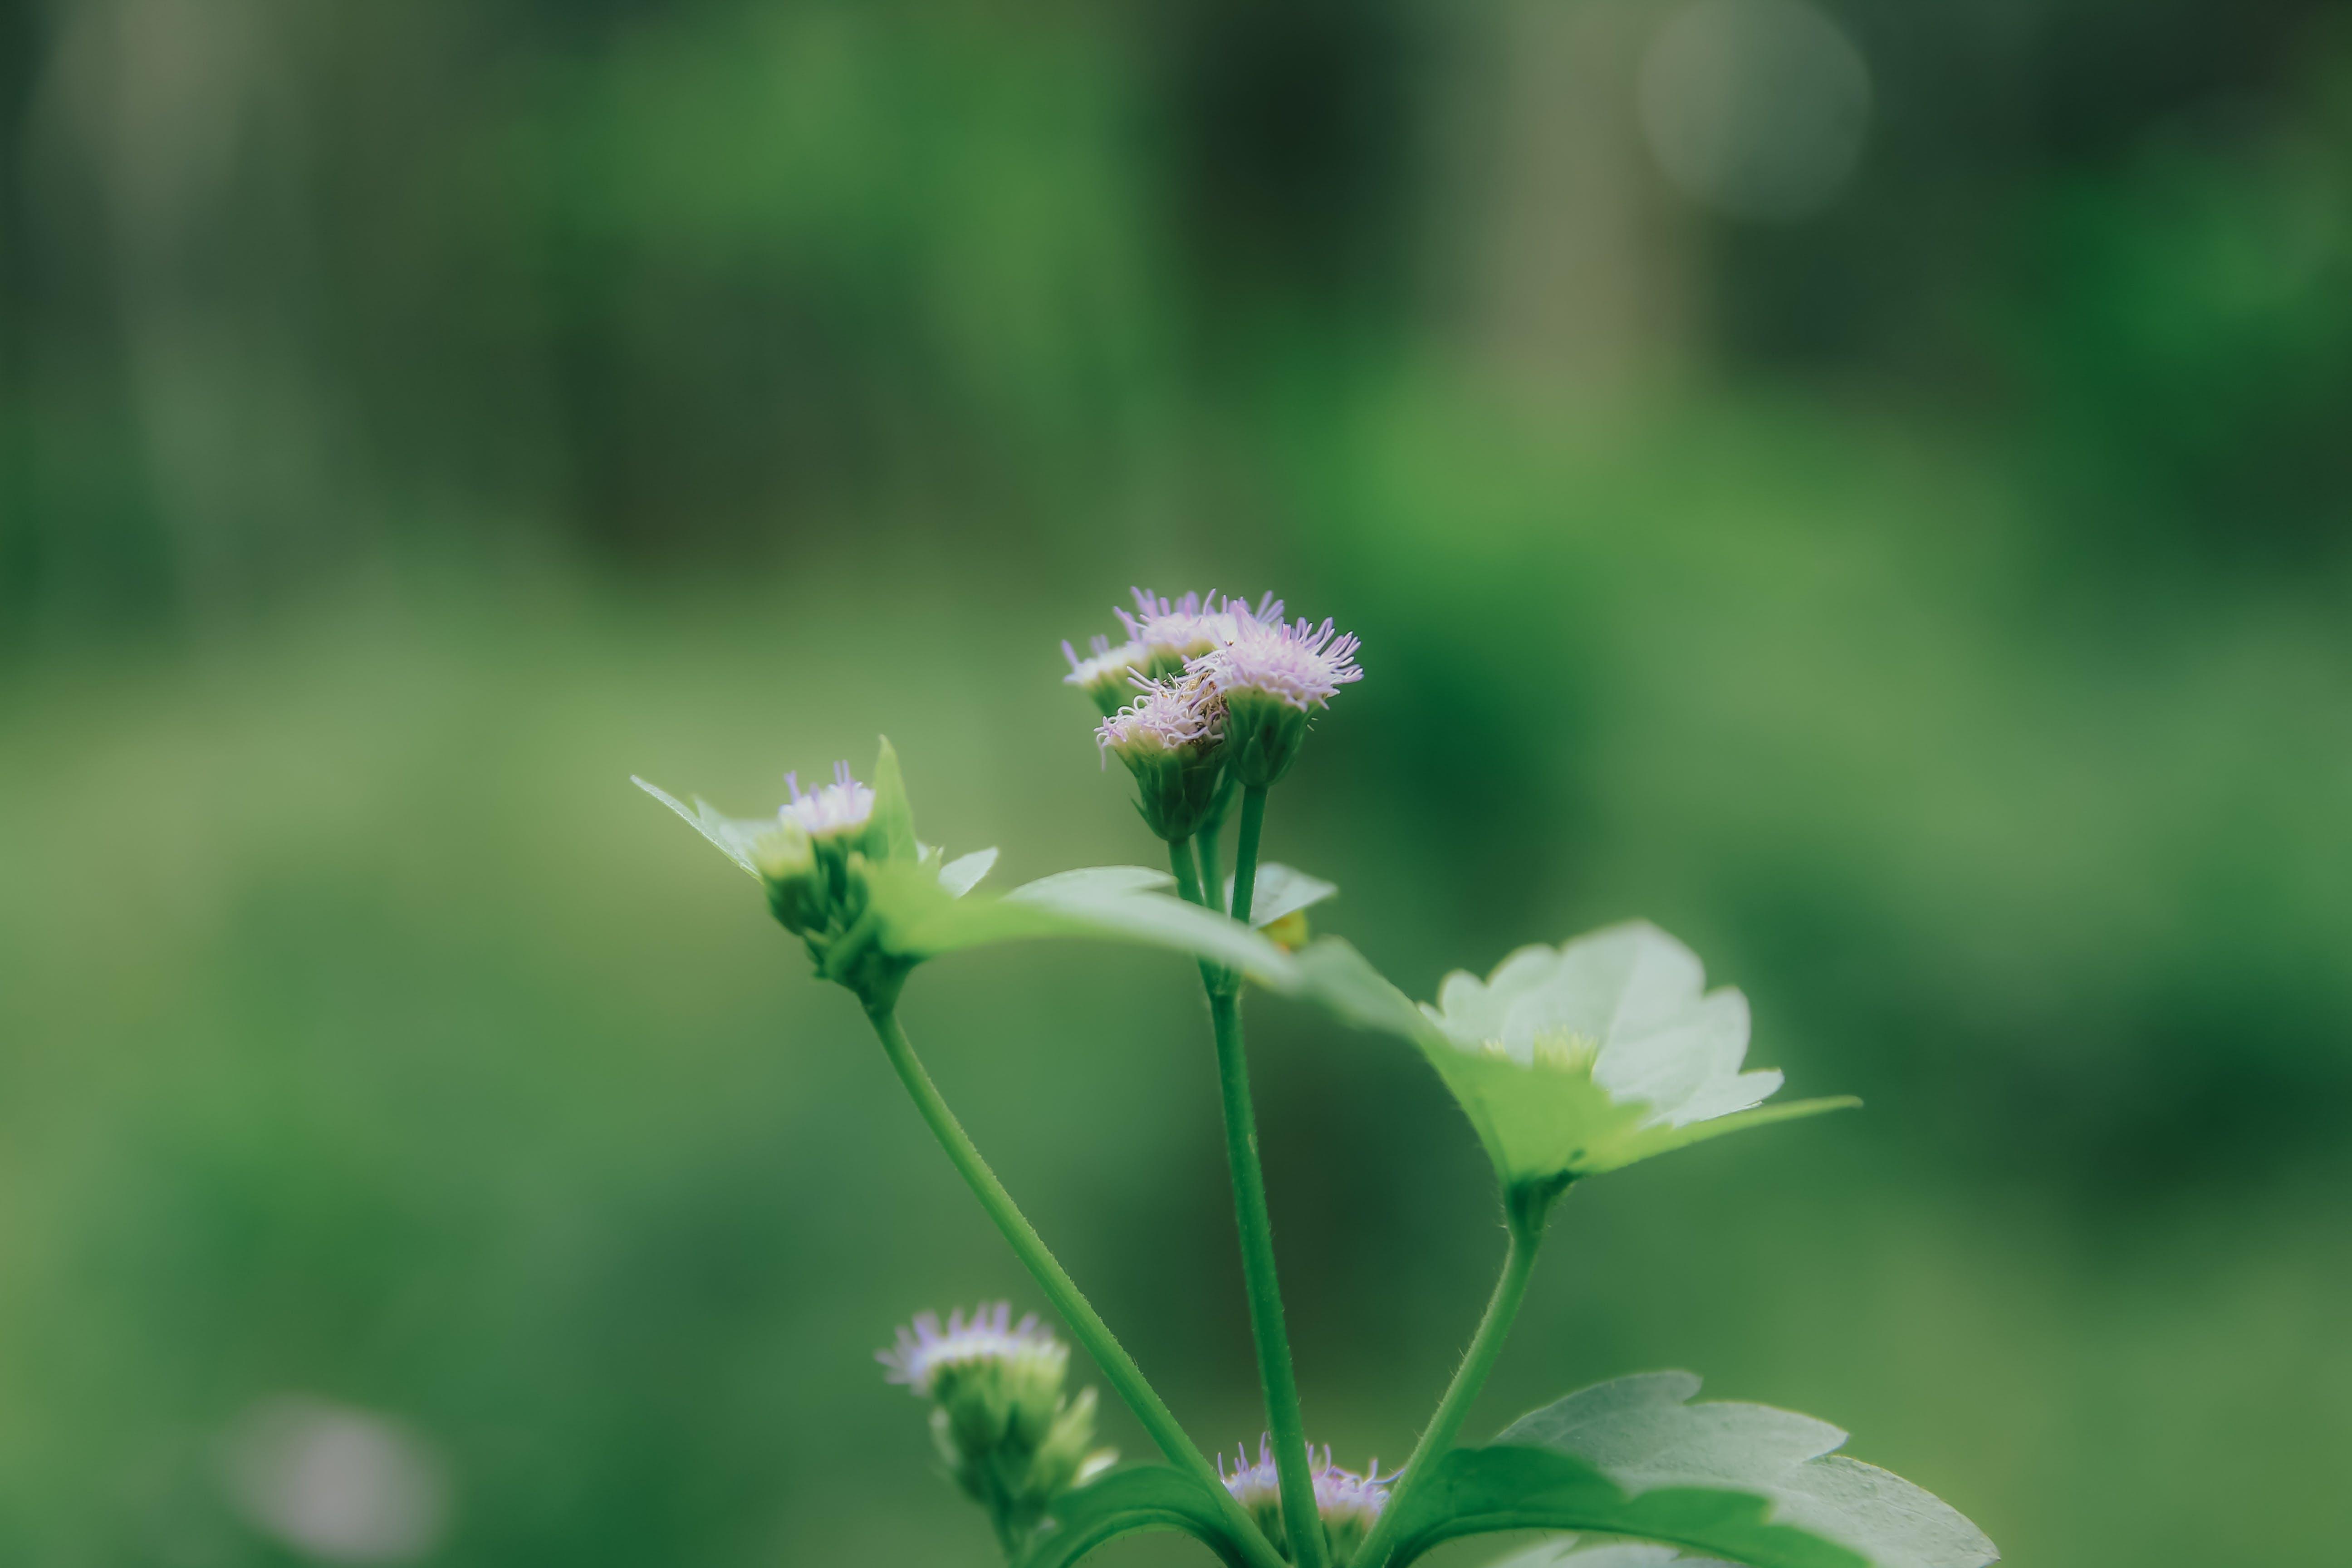 Free stock photo of nature, grass, blur, green